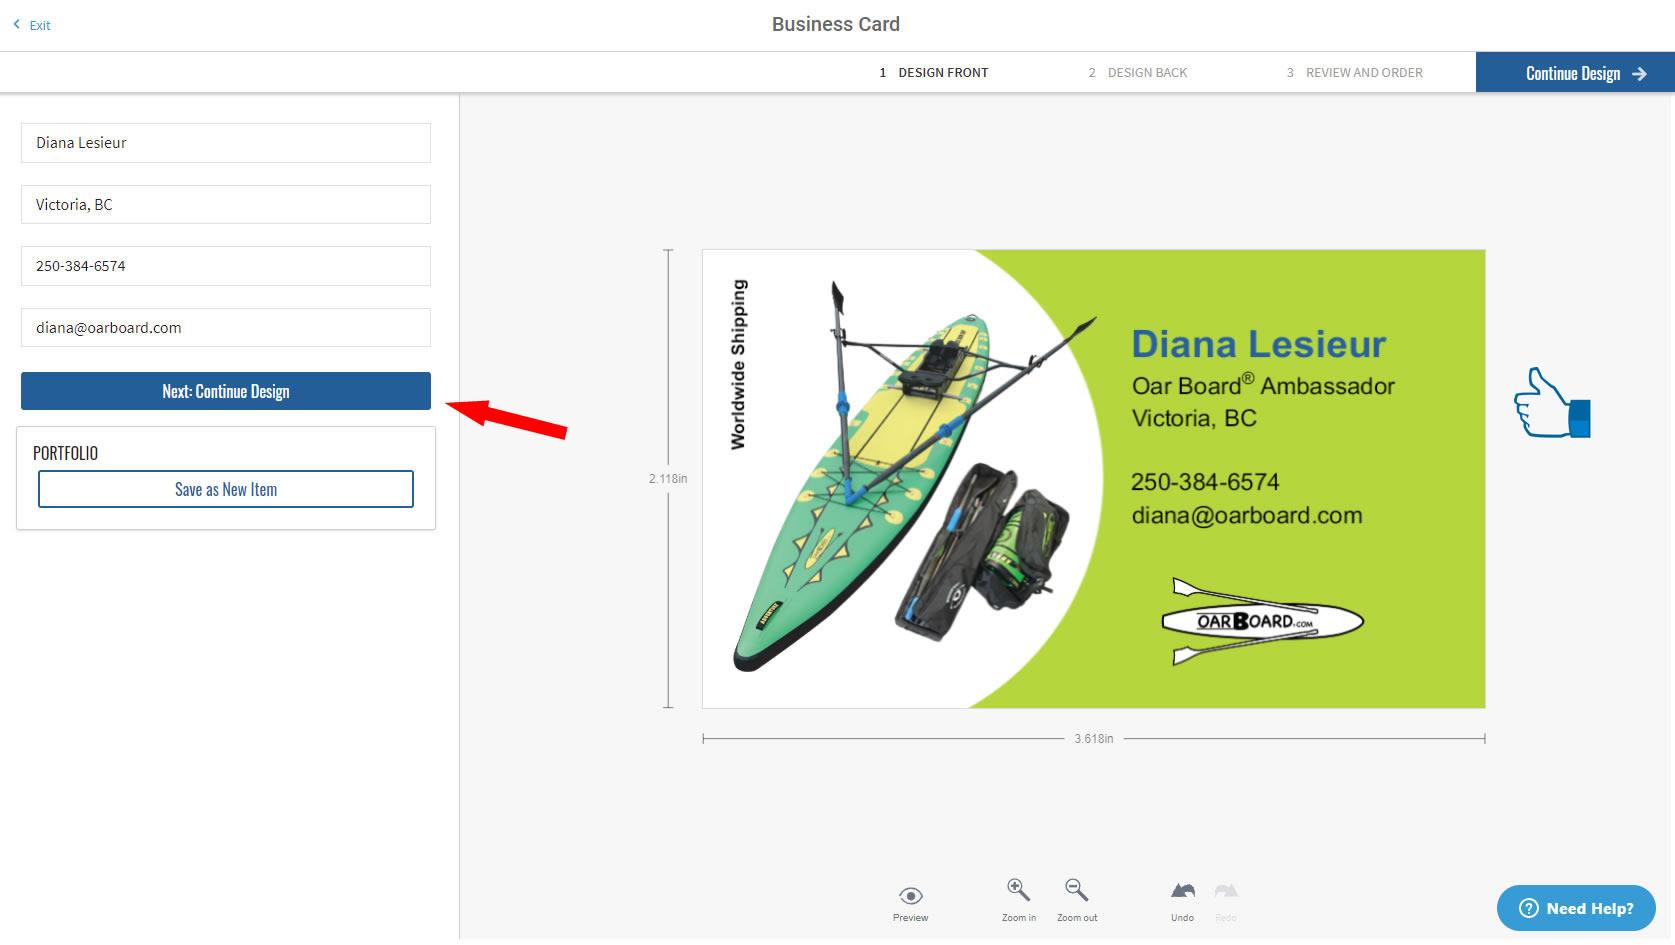 oar-board-vistaprint-screenshots-6a